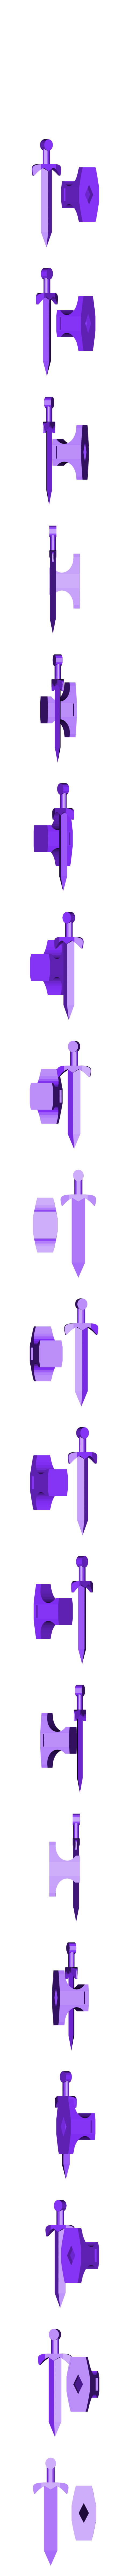 sword_in_the_anvil_and_sword_together.stl Download free STL file Sword in the Anvil • 3D print design, Balkhagal4D